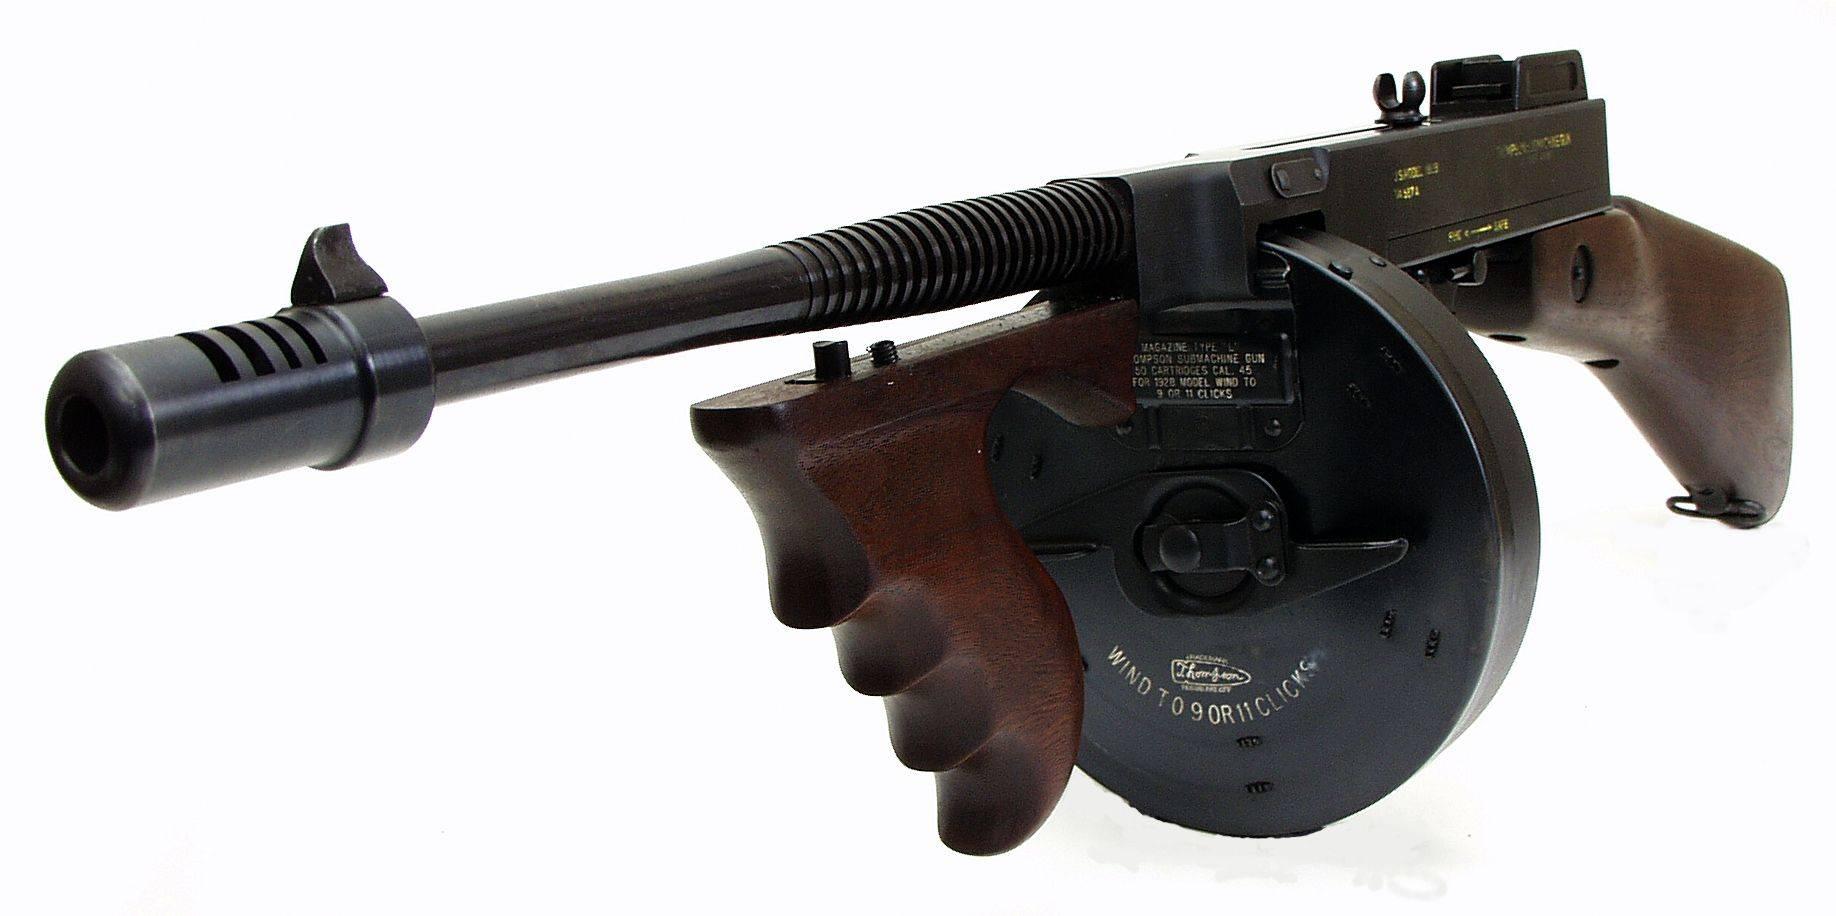 Пистолет-пулемёт томпсона — традиция